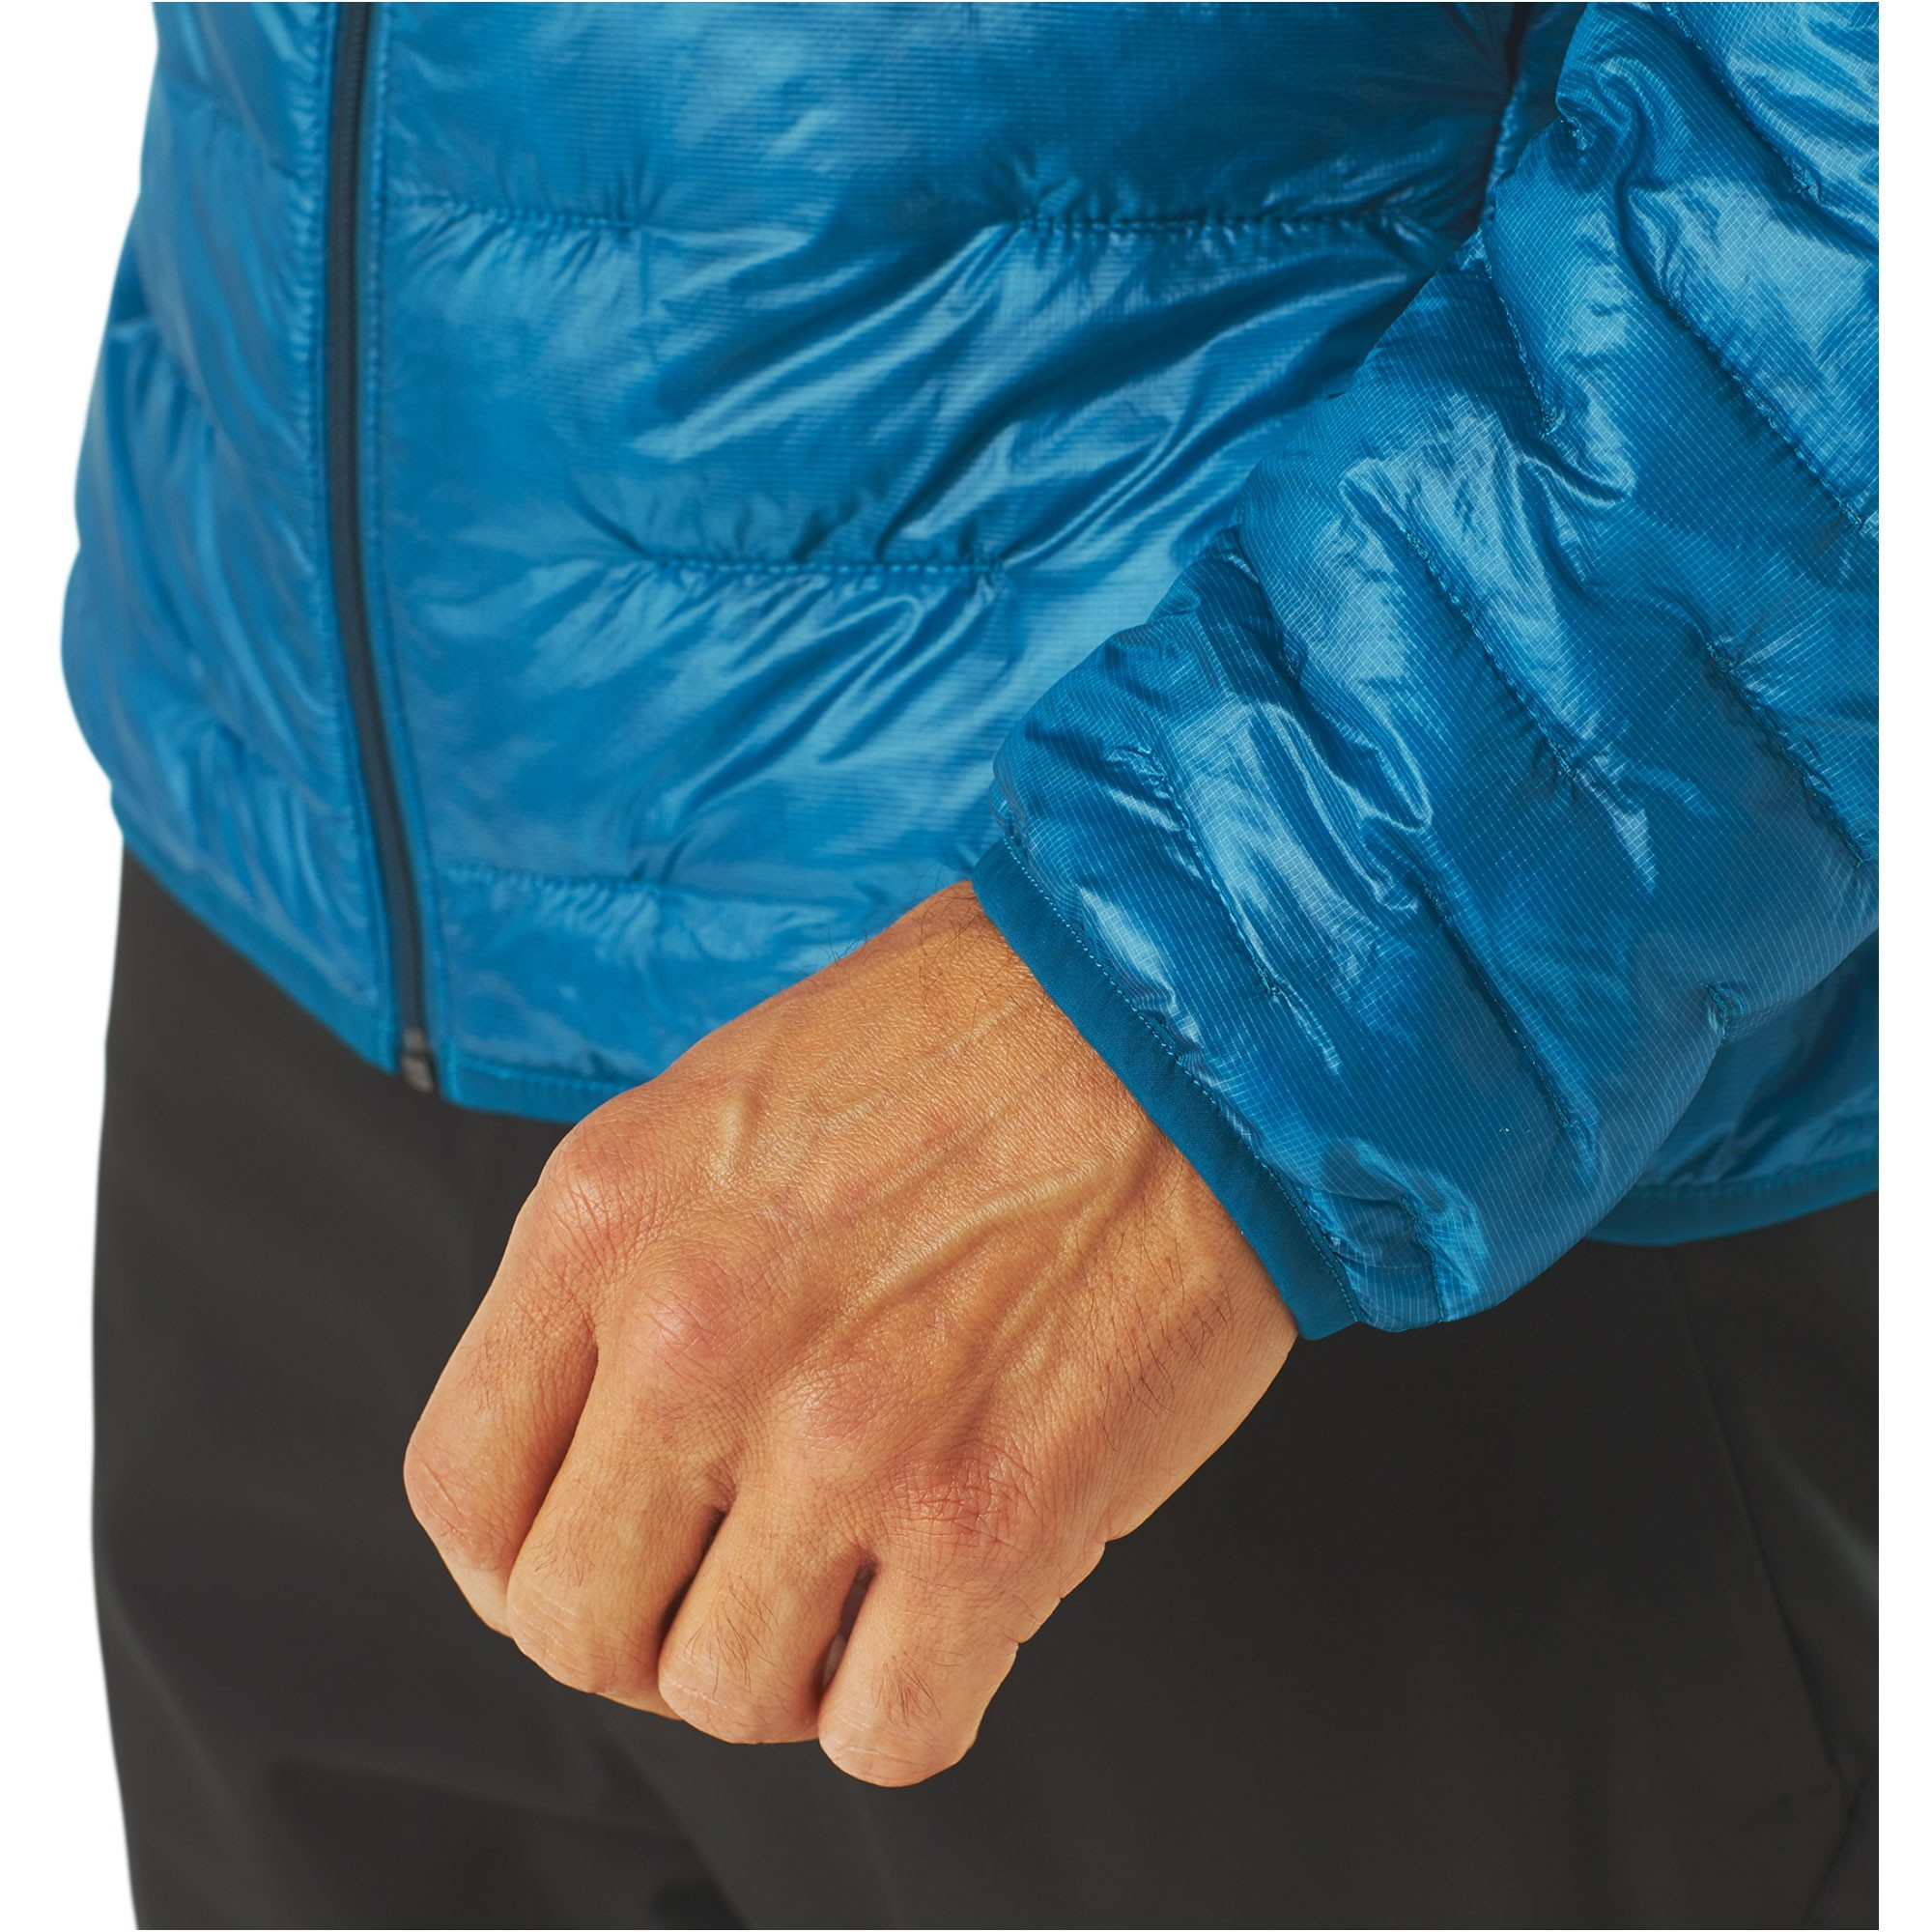 Patagonia Micro-Puff Hoody - Balkan Blue - cuff